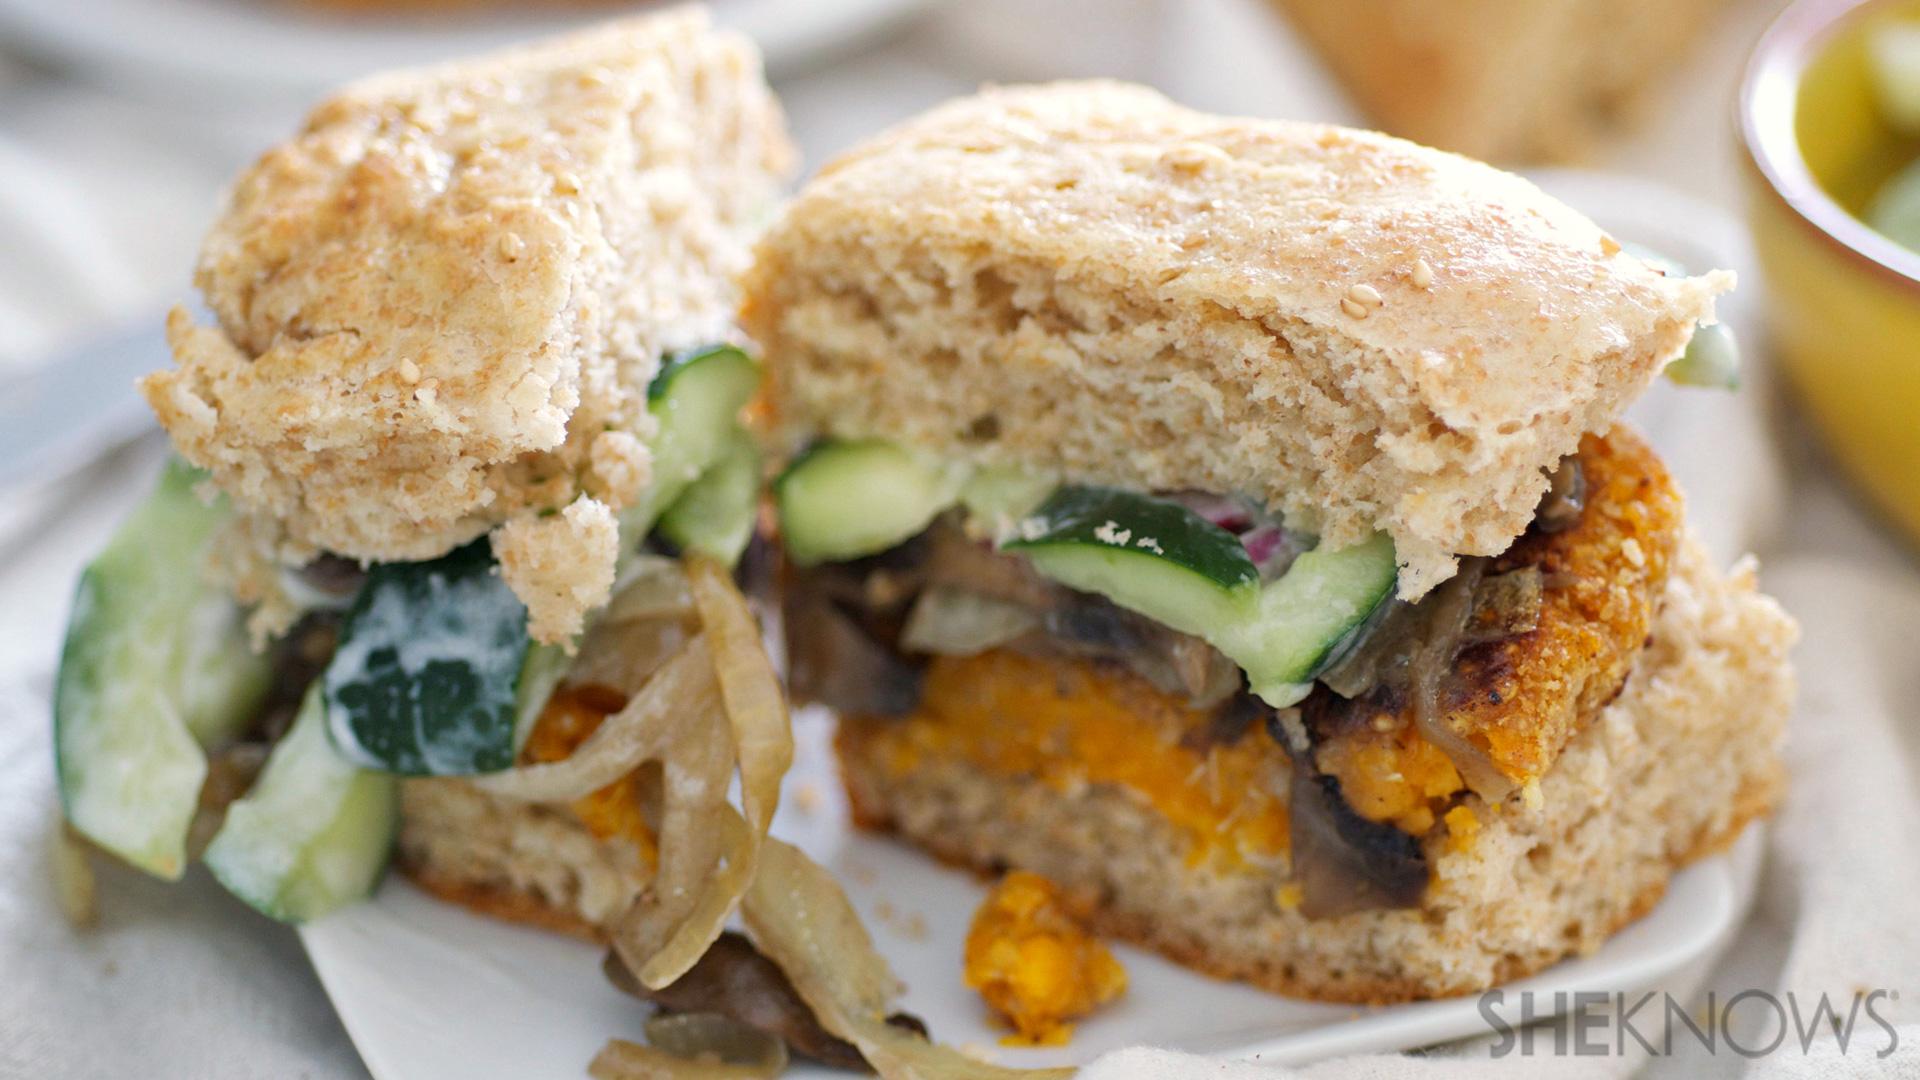 Mushroom and sweet potato burgers with coconut thai slaw